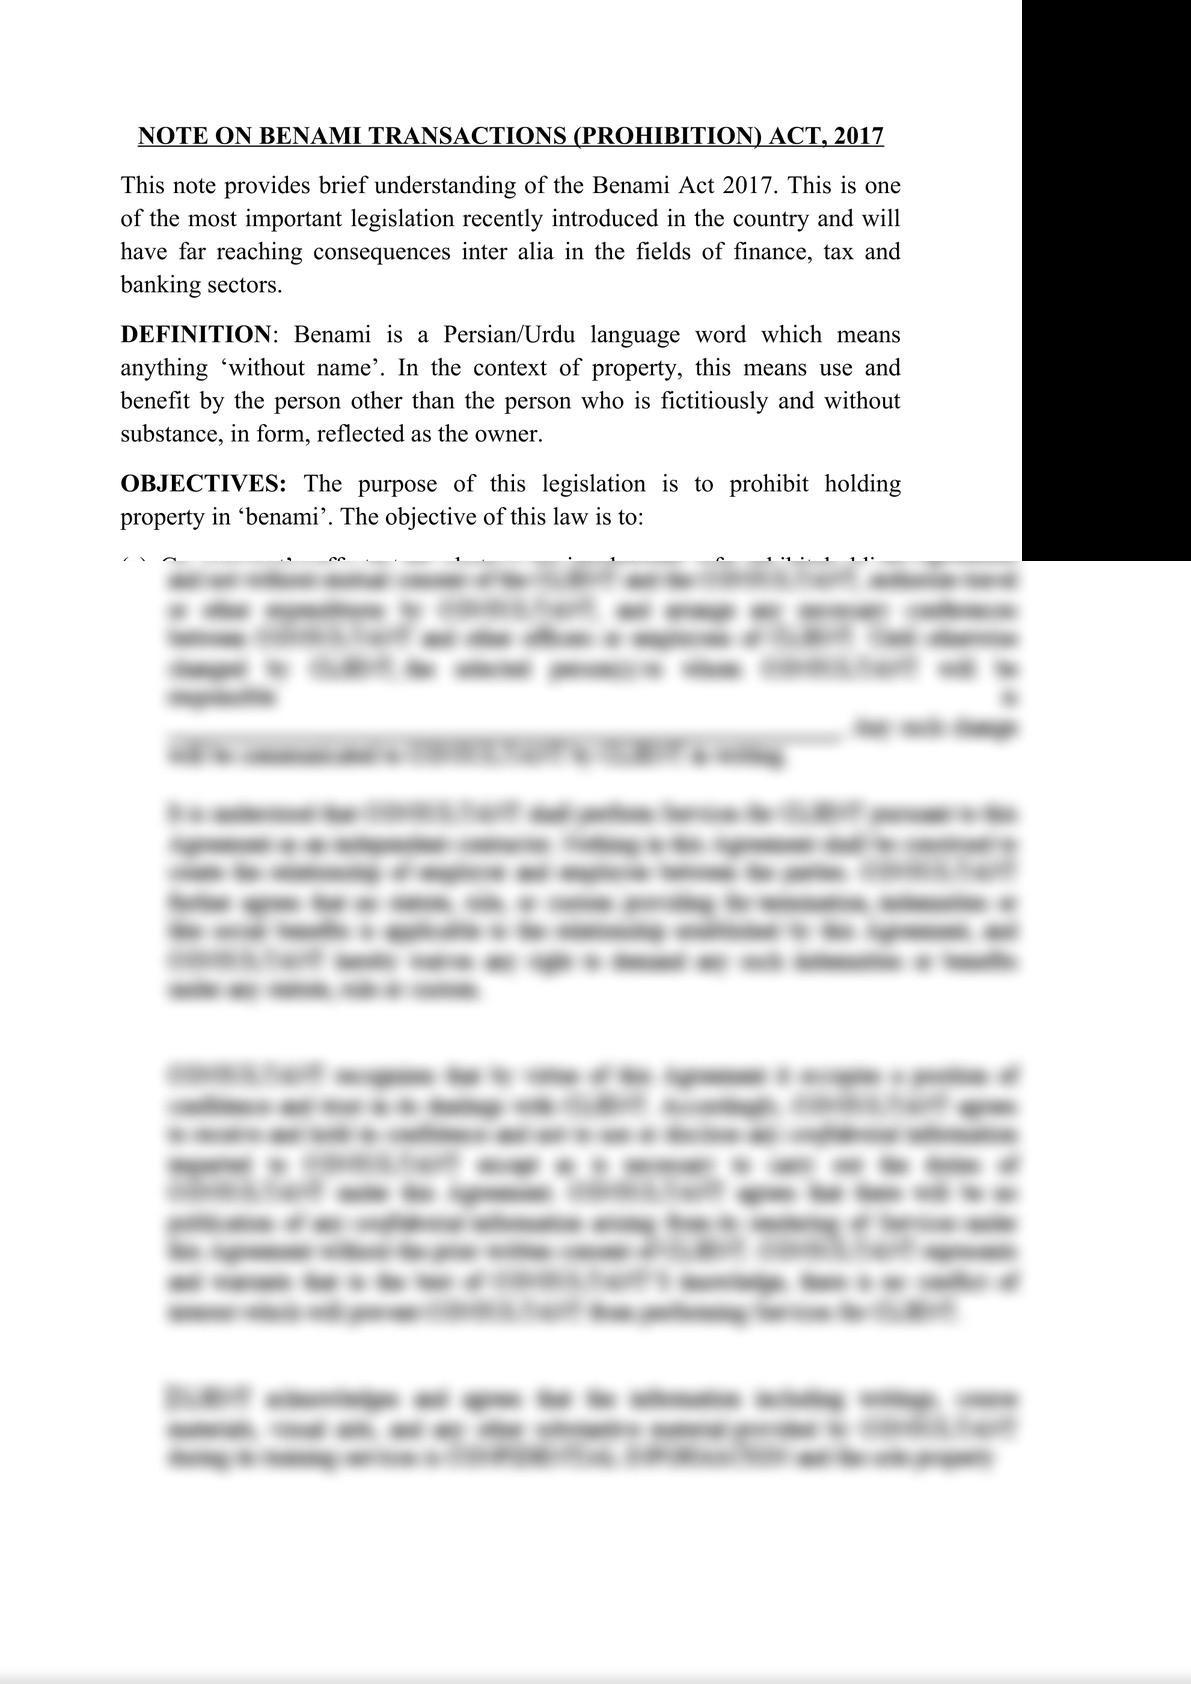 NOTES ON BENAMI TRANSACTIONS (PROHIBITION) ACT, 2017-0